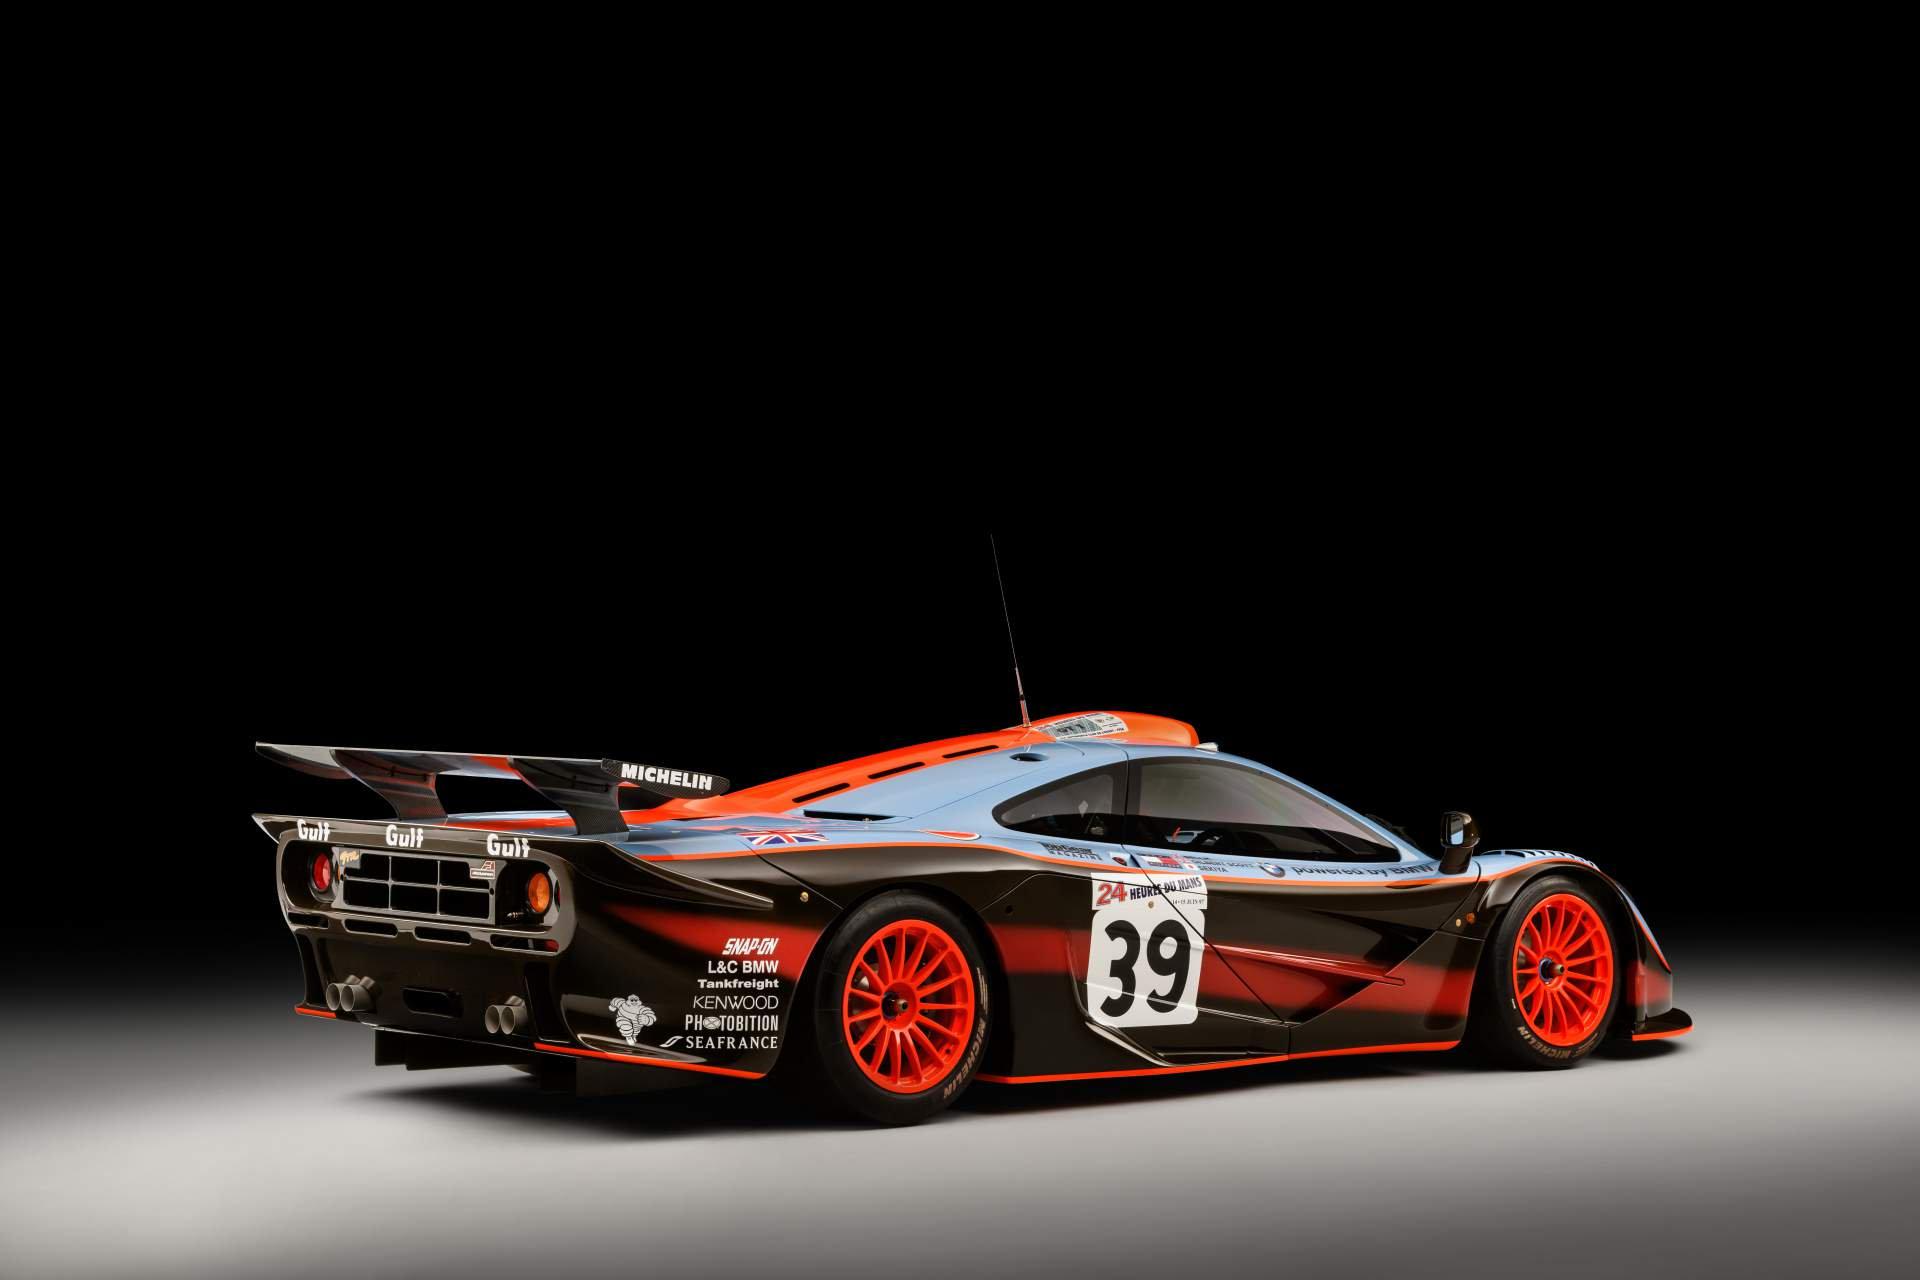 McLaren F1 GTR Longtail 25R restored by MSO (6)